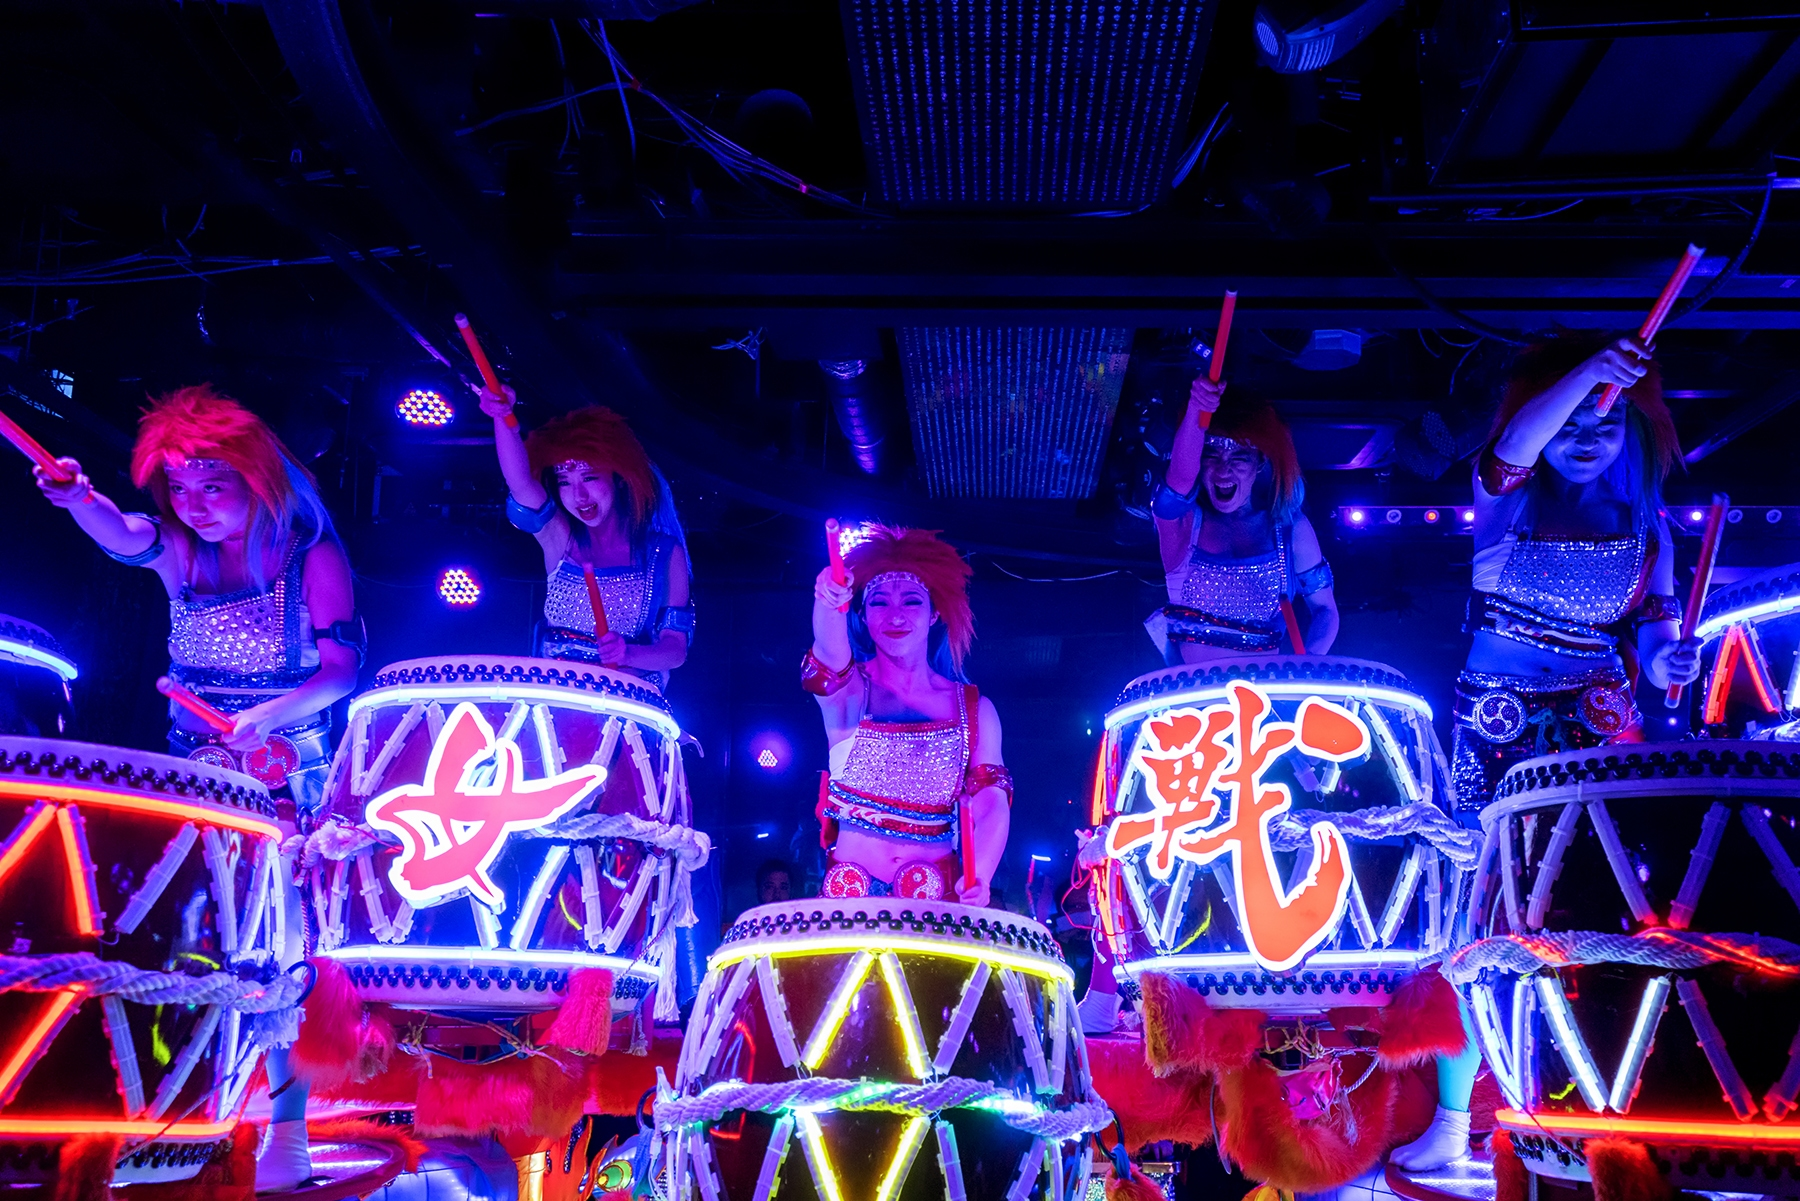 robot restaurant, shinjuku, tokyo, drummers, girls, blue, show, crazy, wild, lights, color,